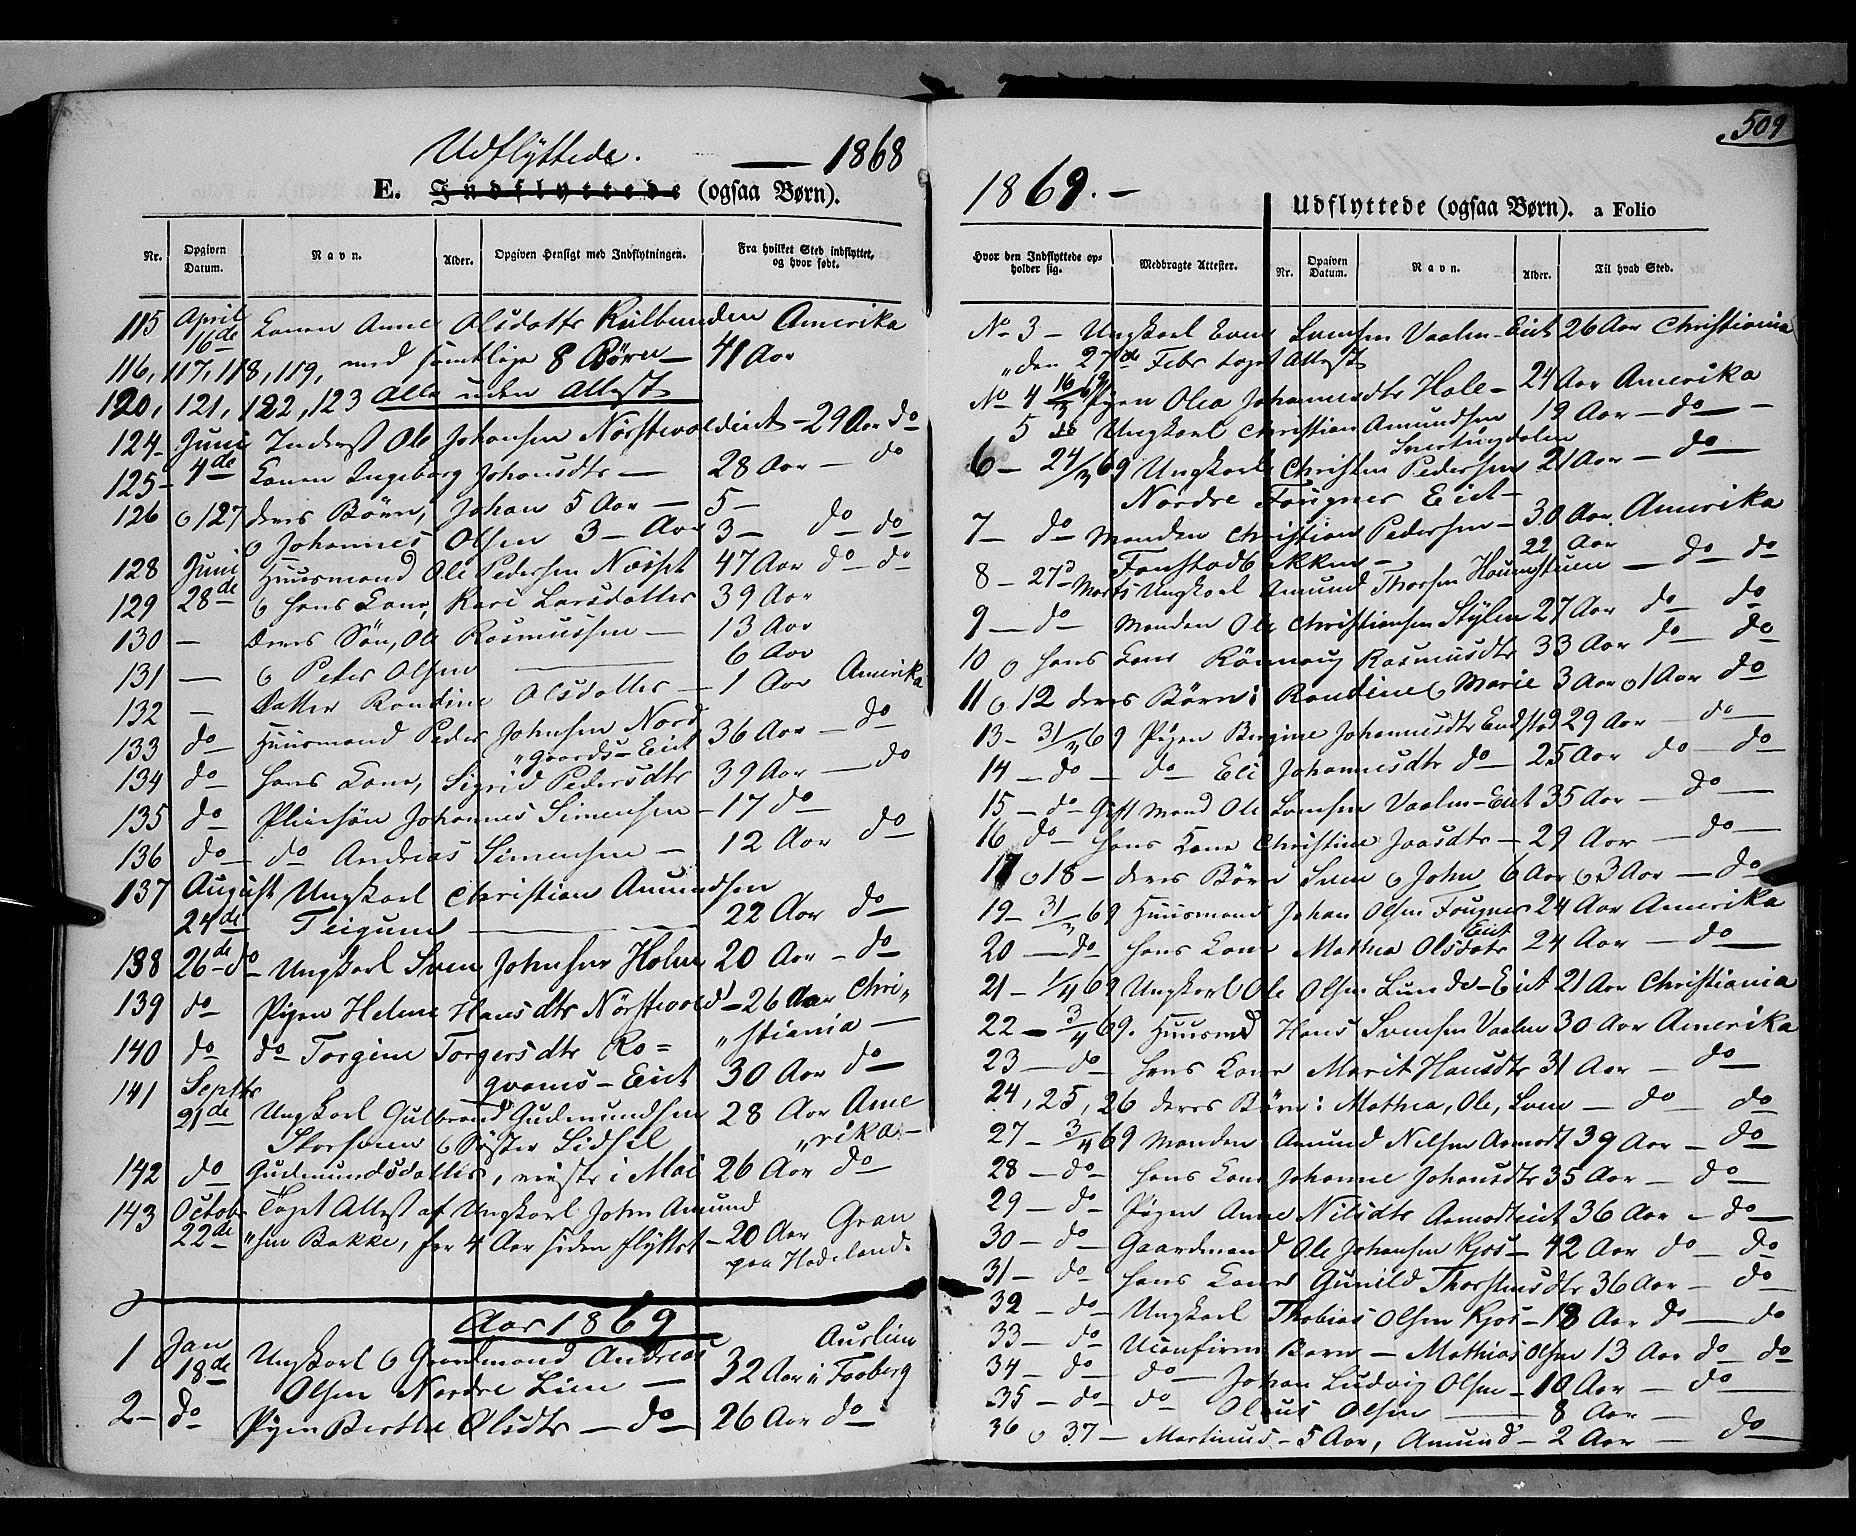 SAH, Gausdal prestekontor, Ministerialbok nr. 9, 1862-1873, s. 509